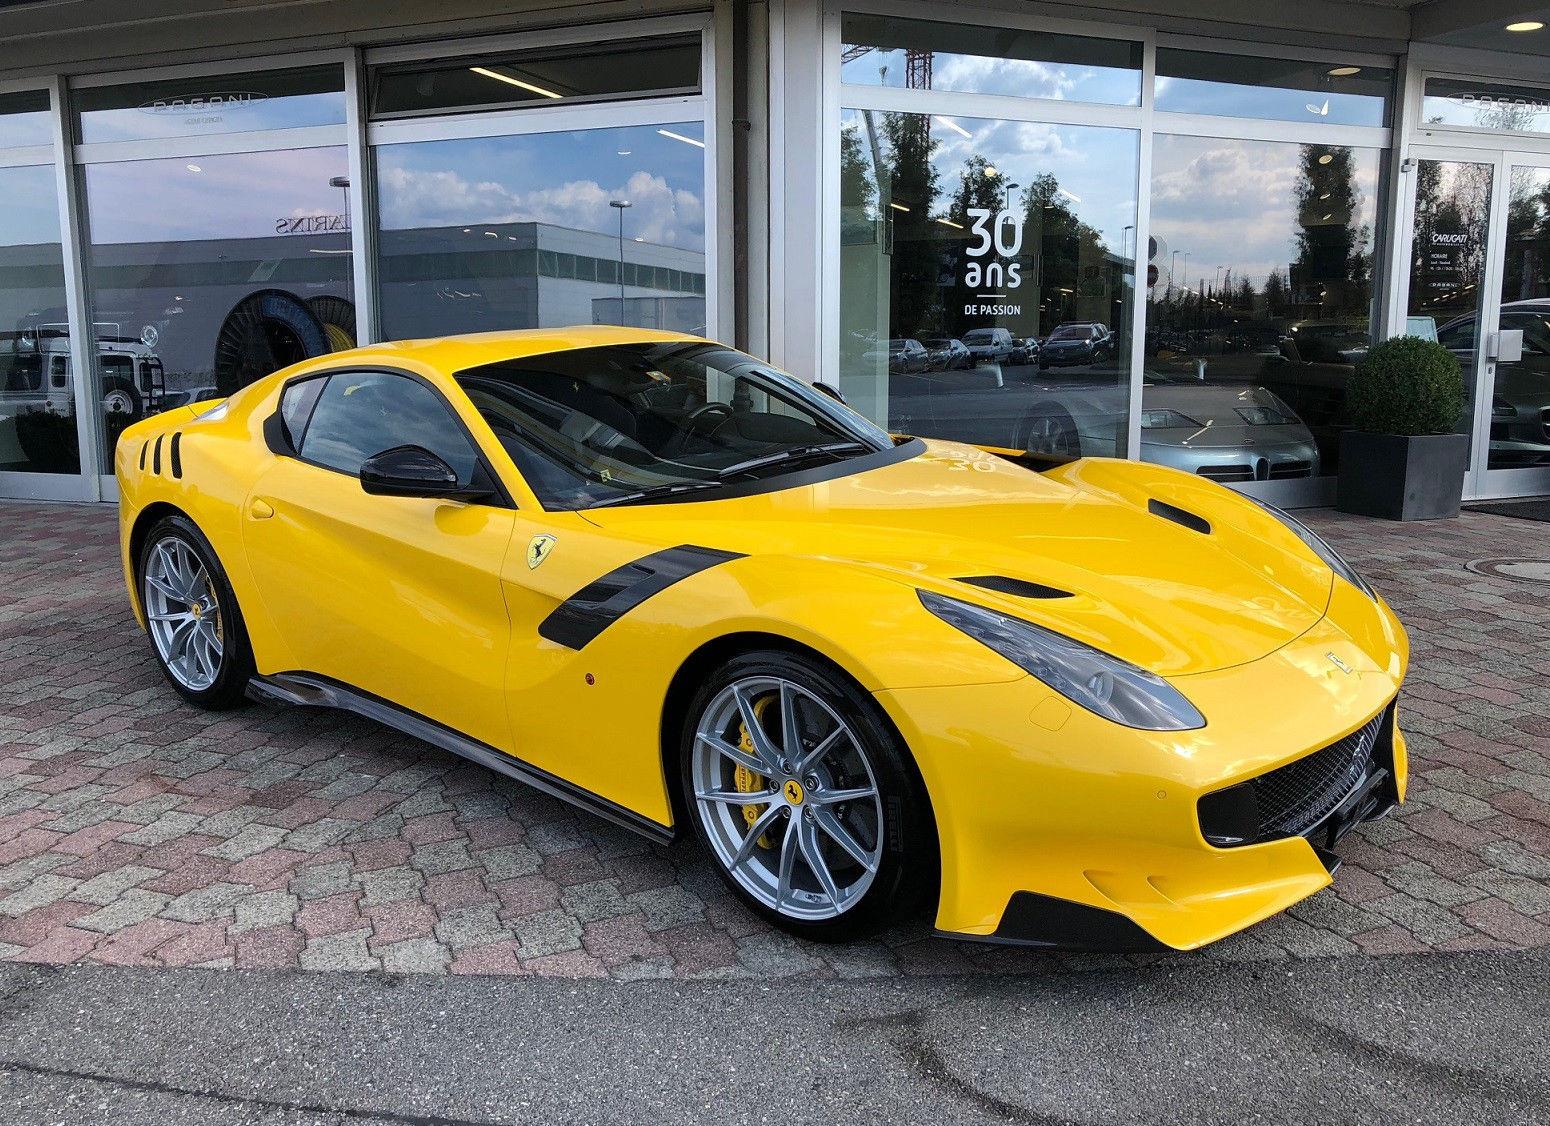 Ferrari F12 Tdf Luxury Pulse Cars Germany For Sale On Luxurypulse